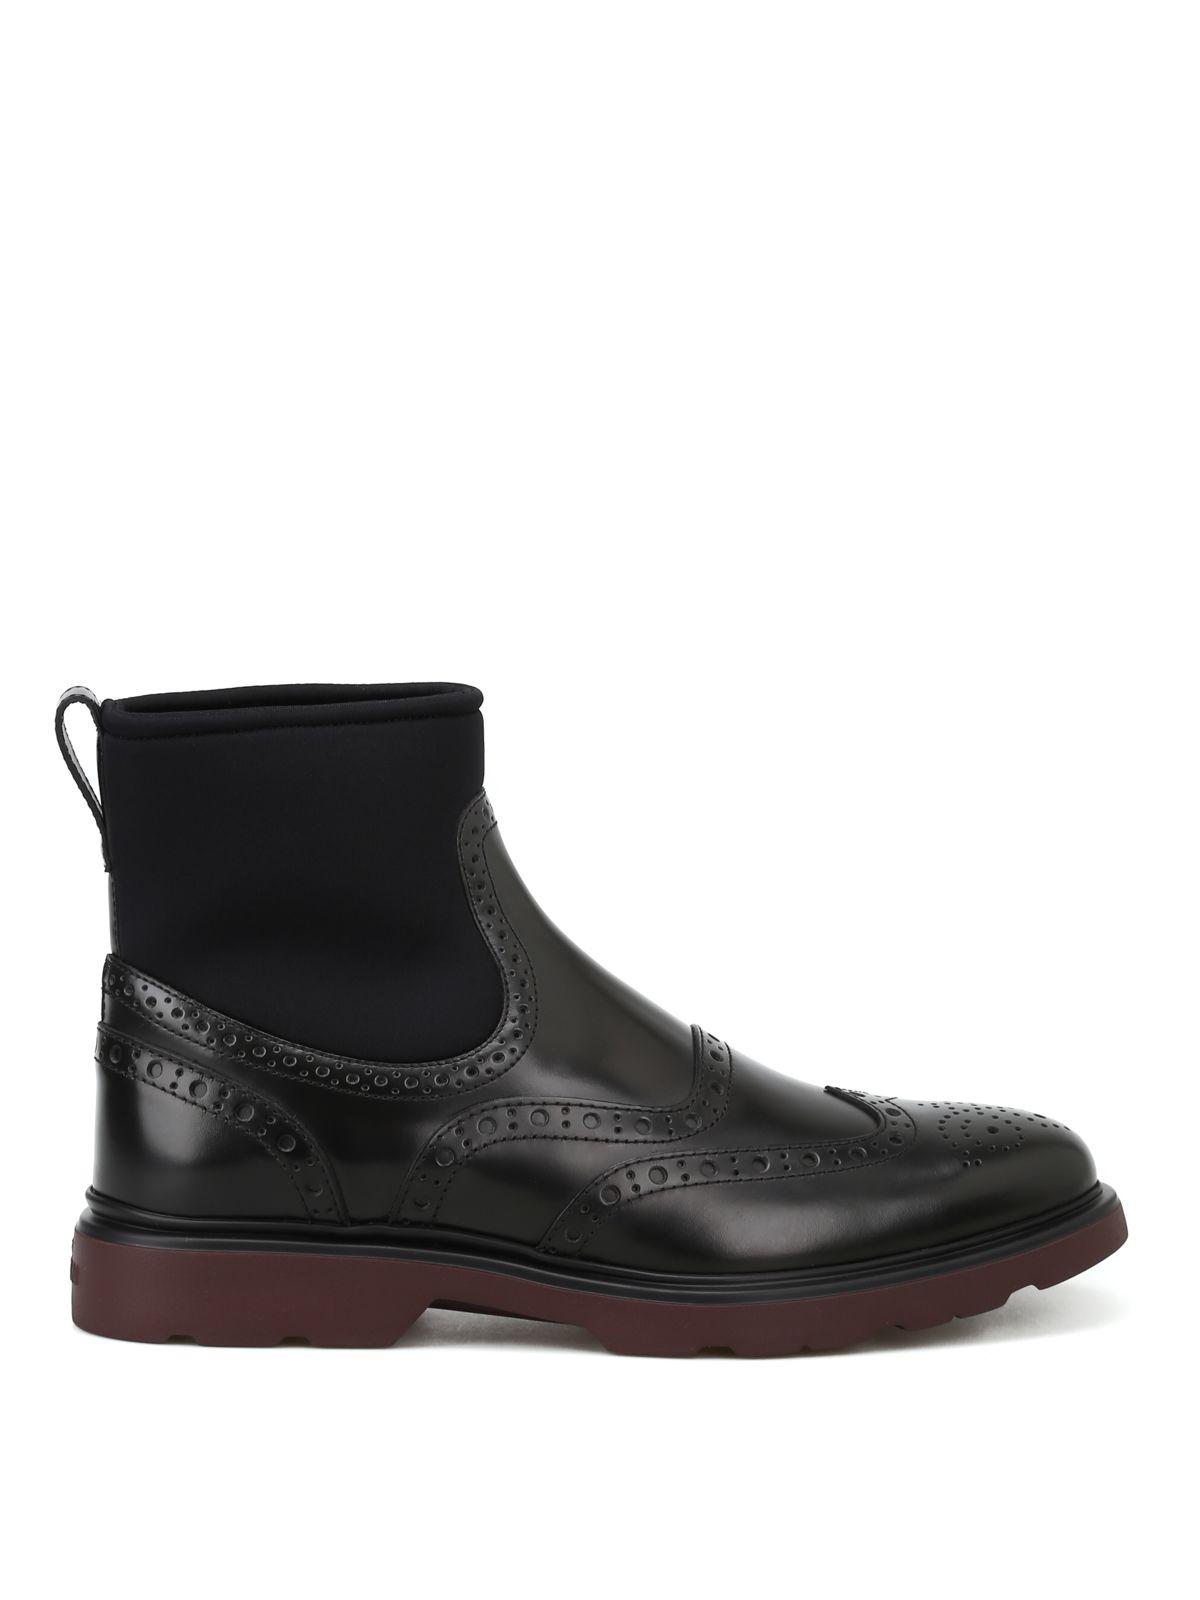 75d03f088d Hogan Hogan Ankle Boots - H304 - Black - 10743272 | italist